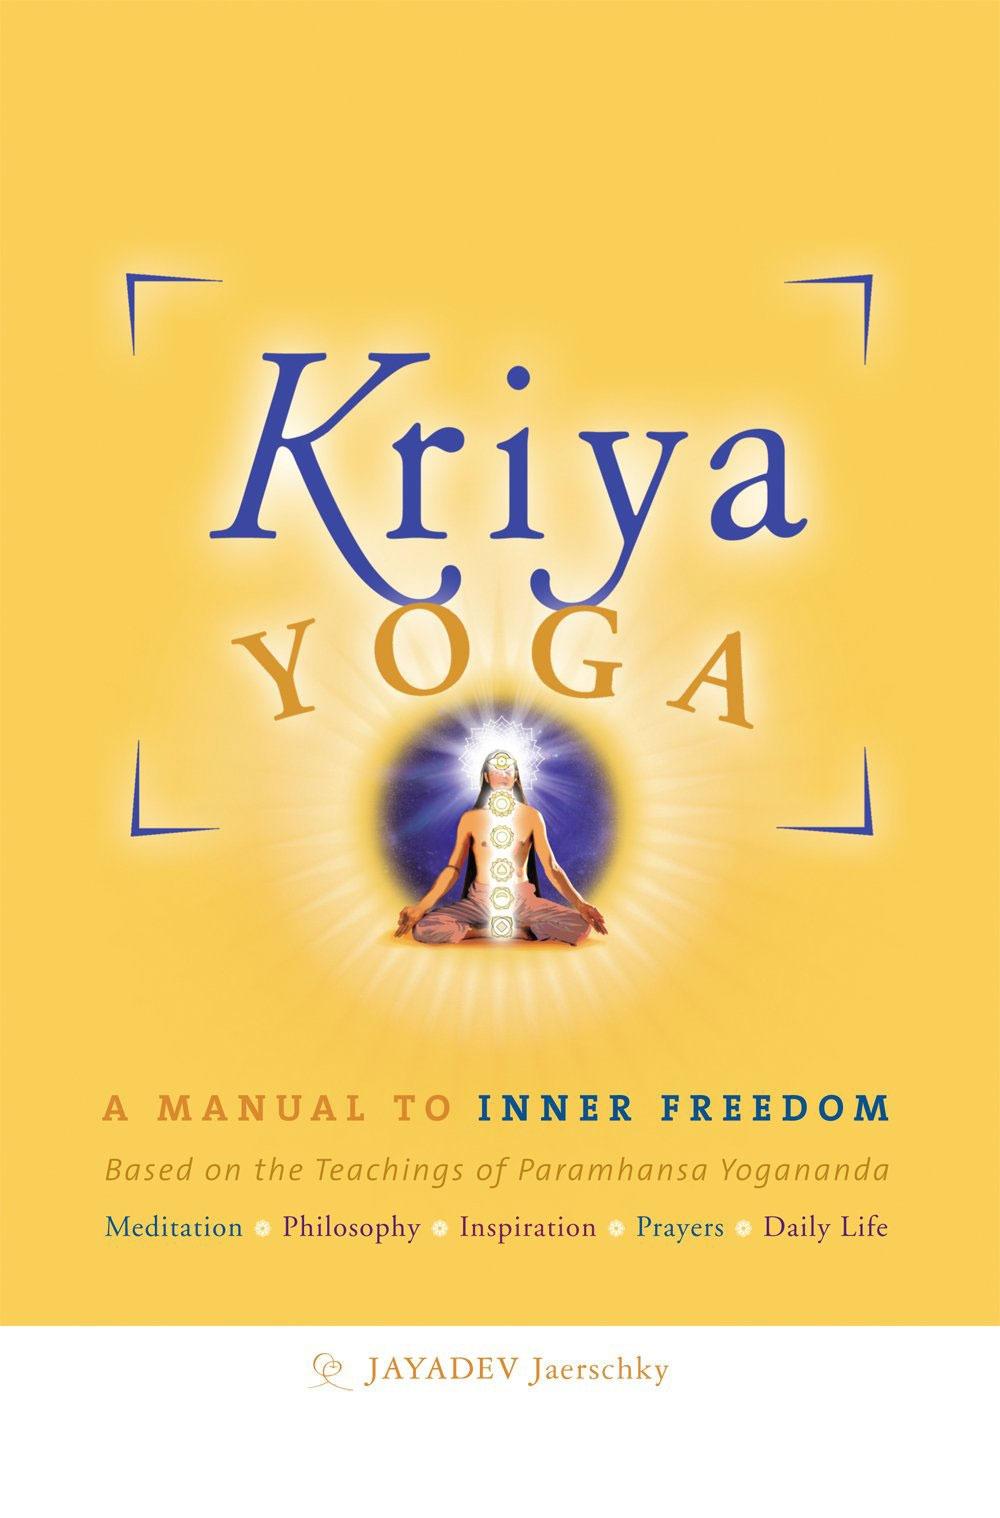 Kriya yoga. A manual to inner freedom. Based on the teachings of Paramhansa Yogananda